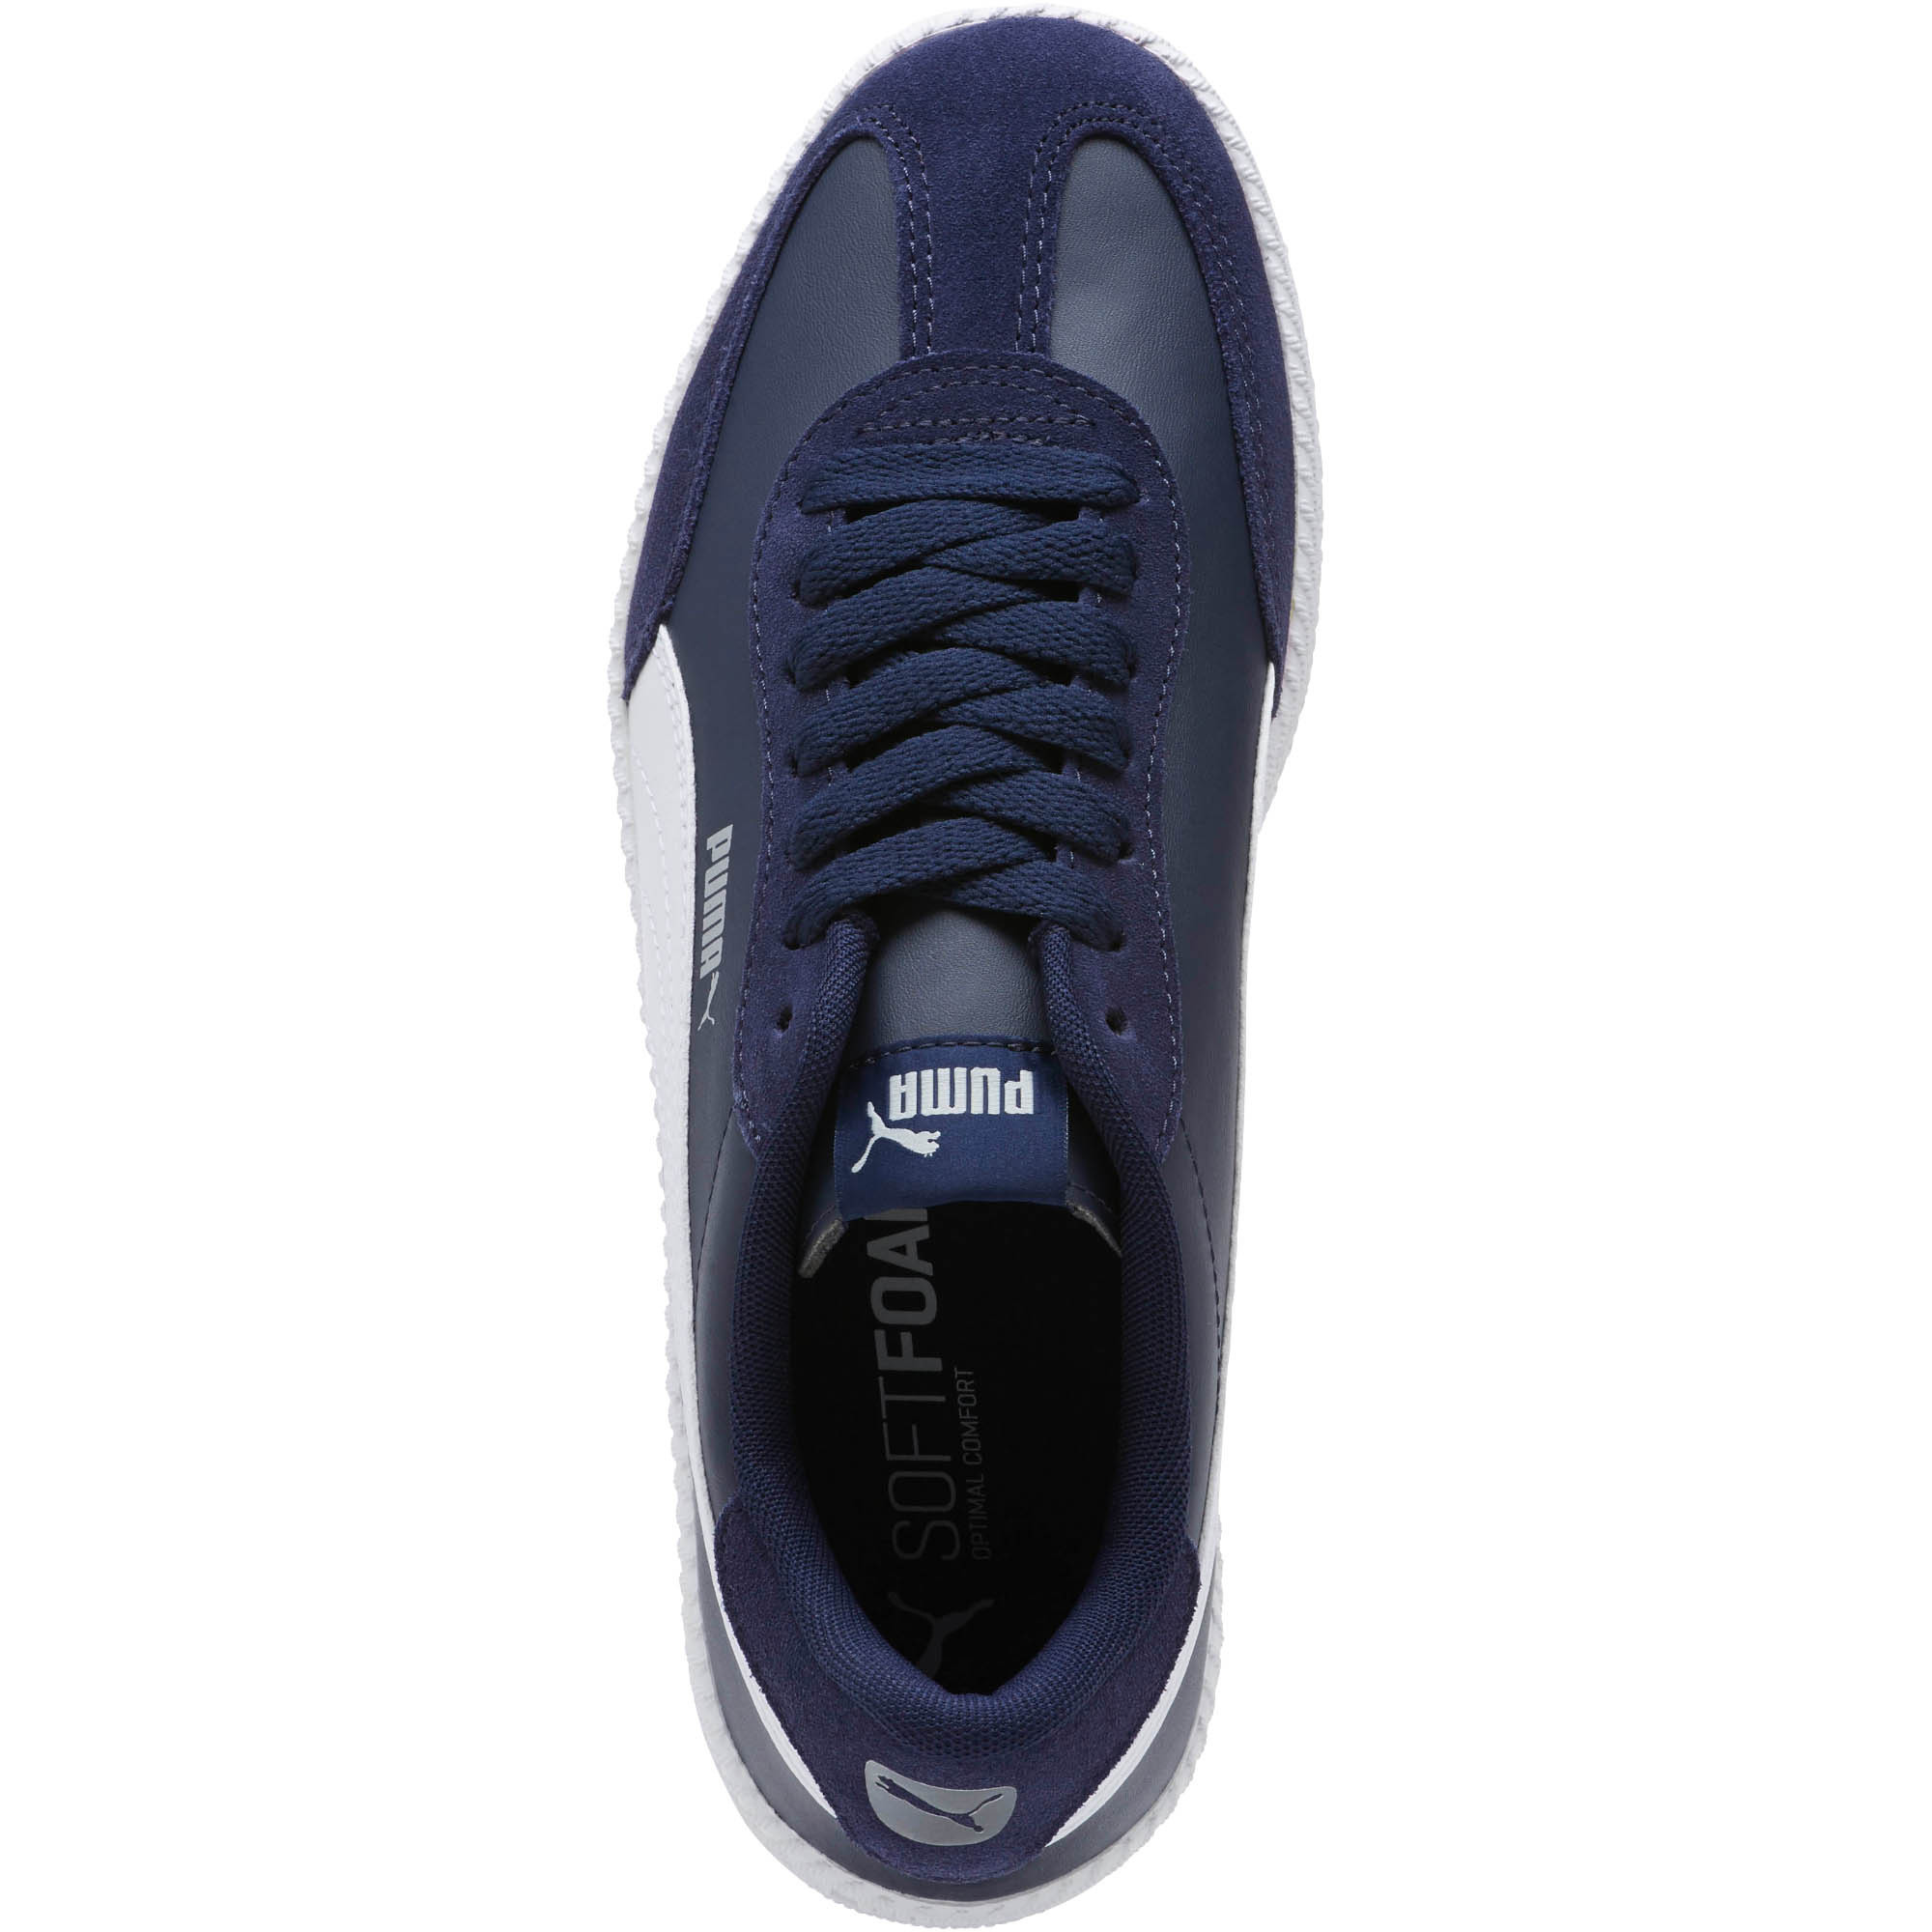 PUMA-Astro-Cup-Sneakers-Men-Shoe-Basics thumbnail 12